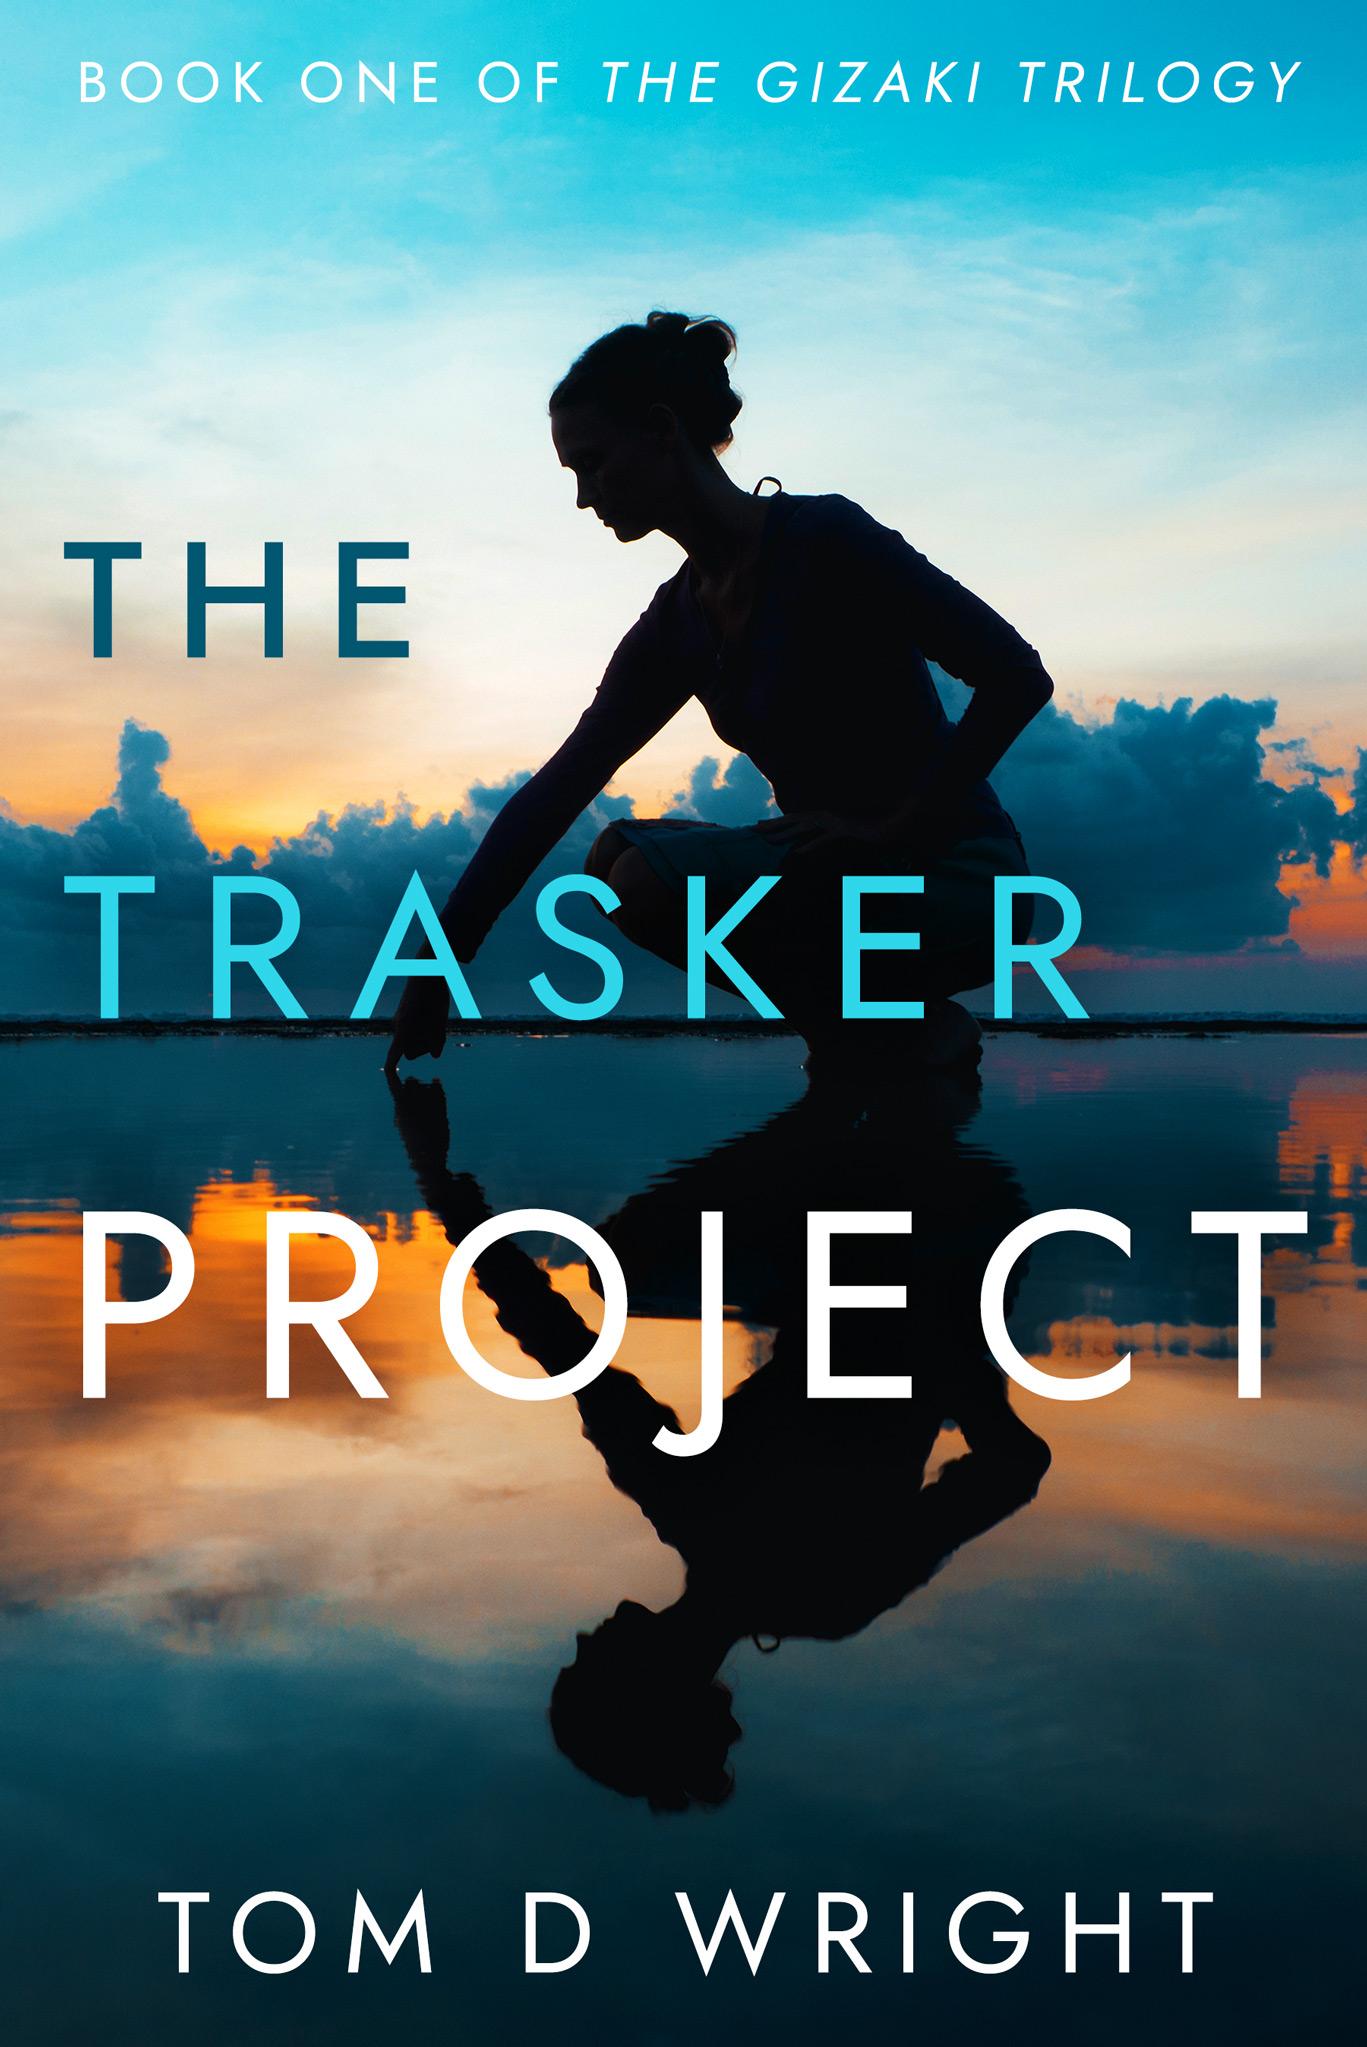 TRASKER_1_EBOOK_COVER.jpg